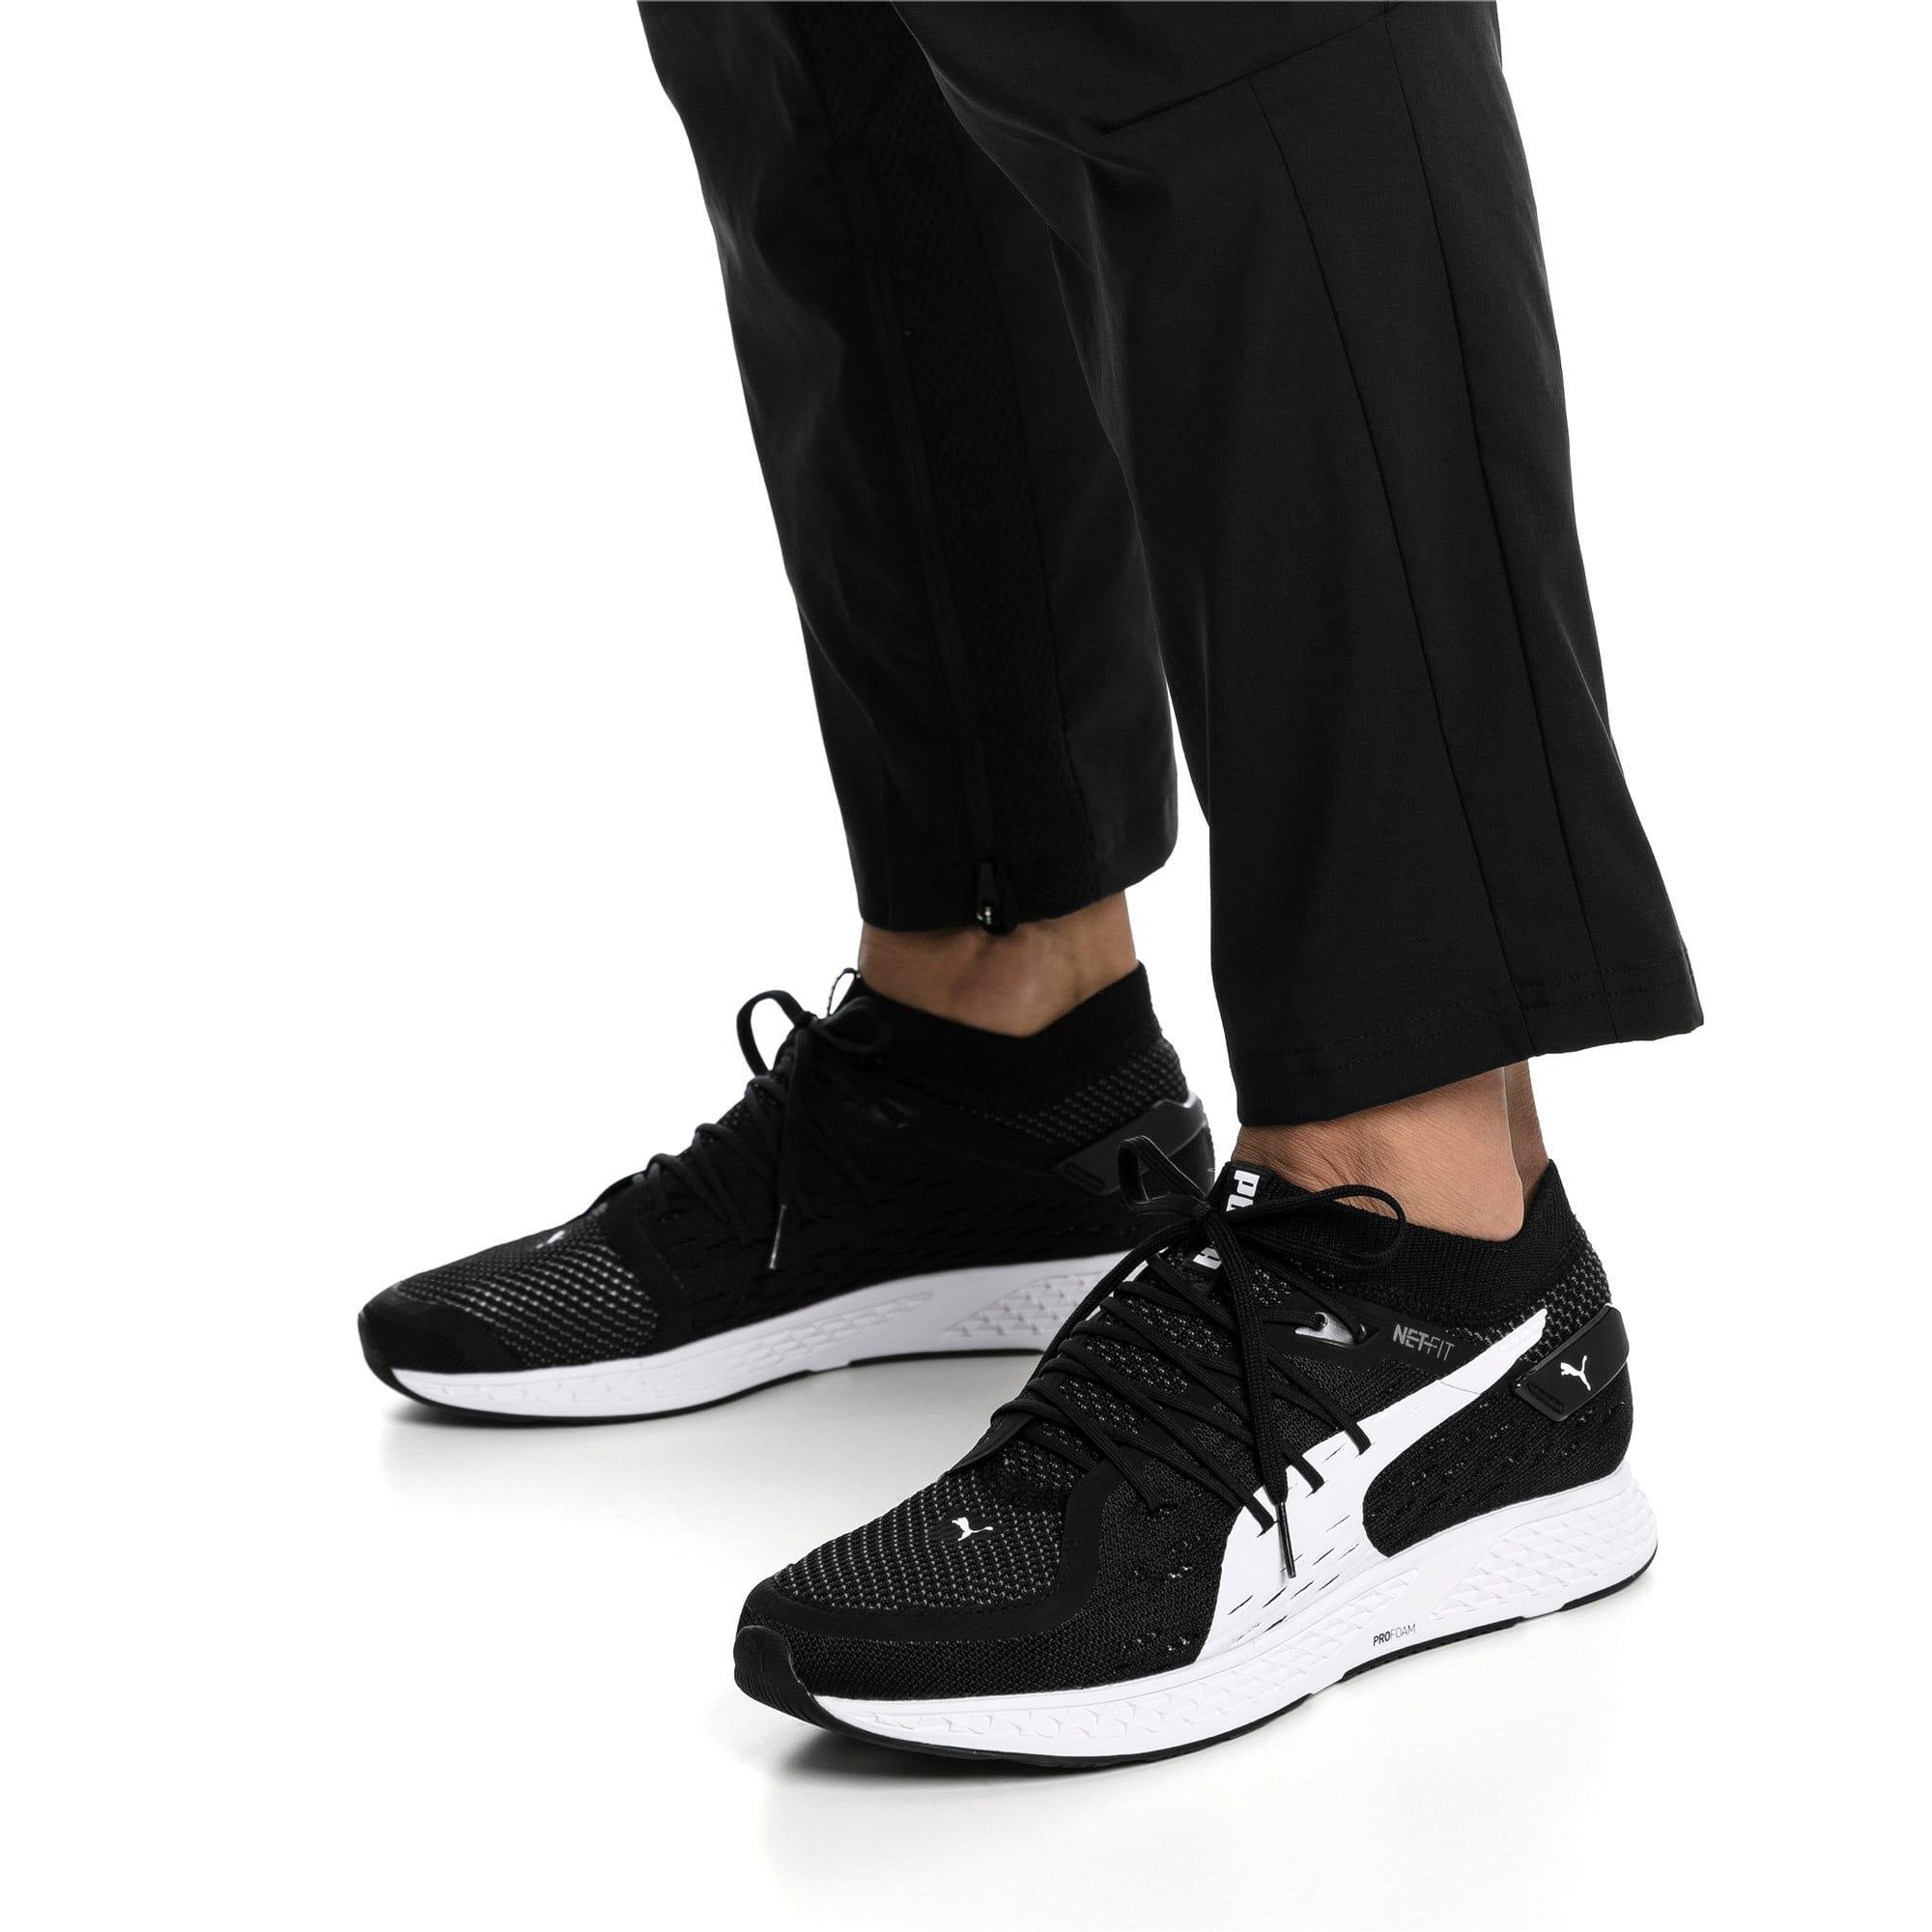 Thumbnail 2 of SPEED 500 Men's Running Shoes, Puma Black-Puma White, medium